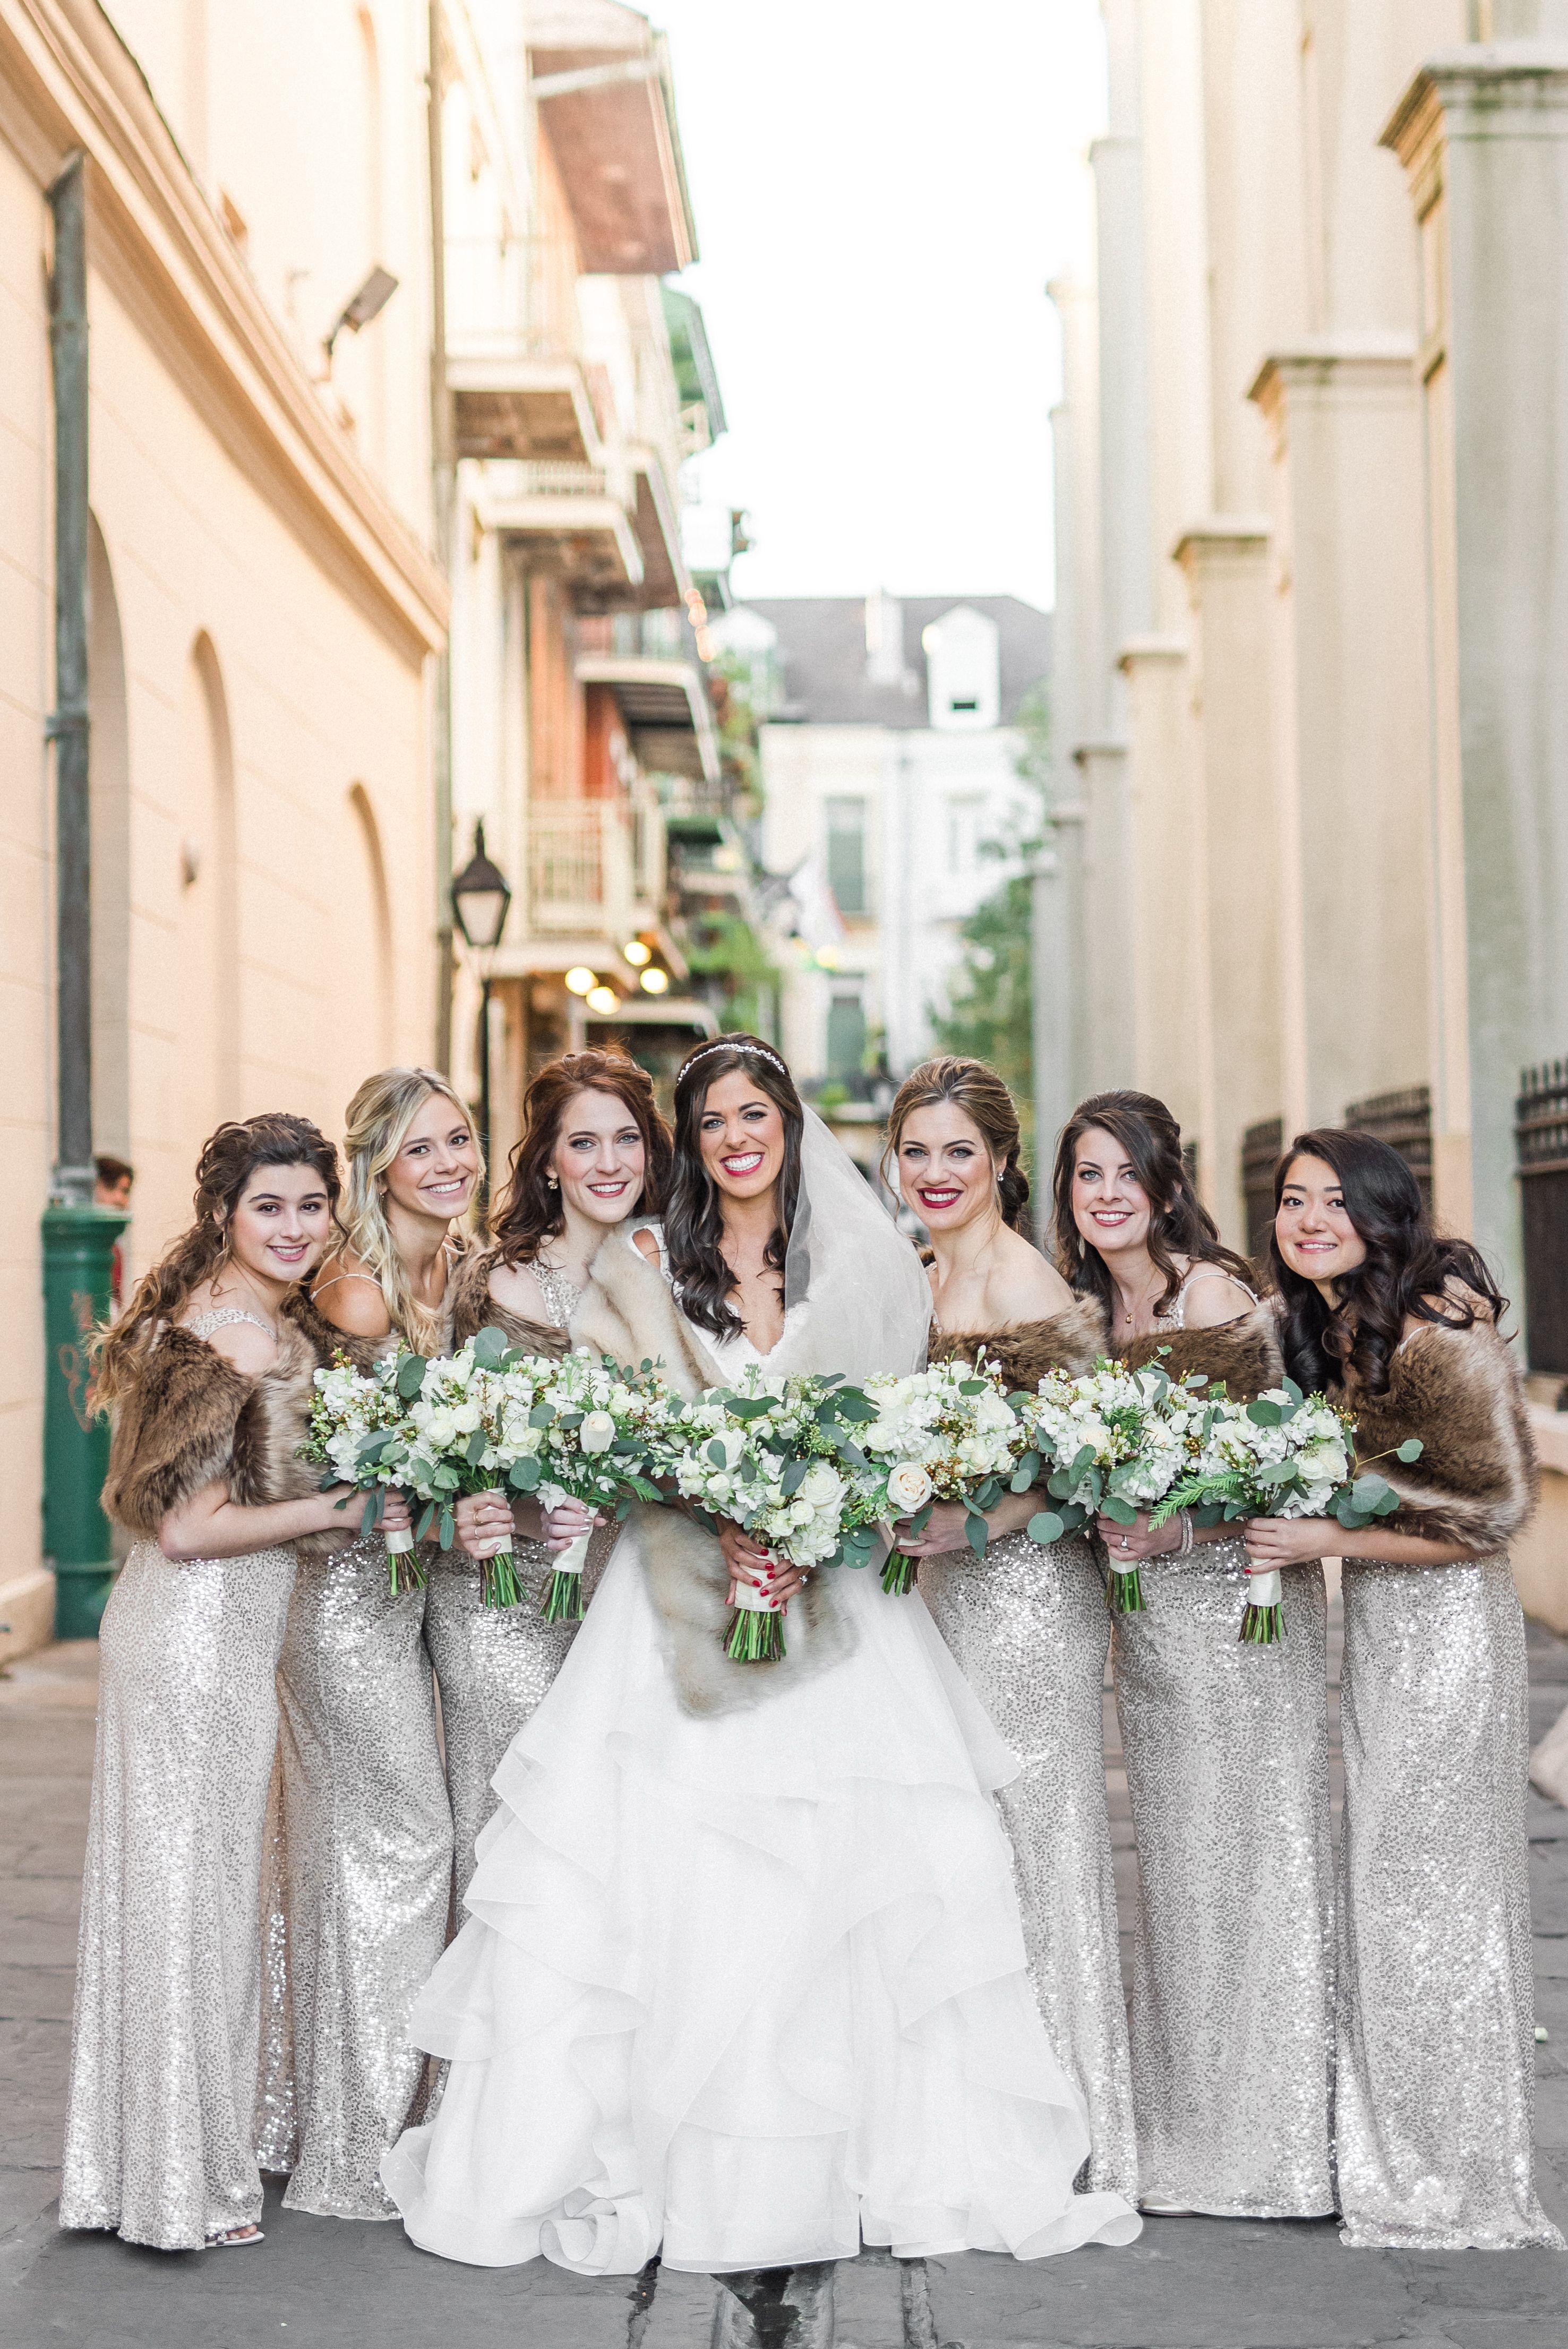 Brown Faux Fur Bridal Wrap Wedding Fur Shrug Brown Fur Wrap Etsy In 2020 Metallic Bridesmaid Dresses Wedding Fur Bridal Fur